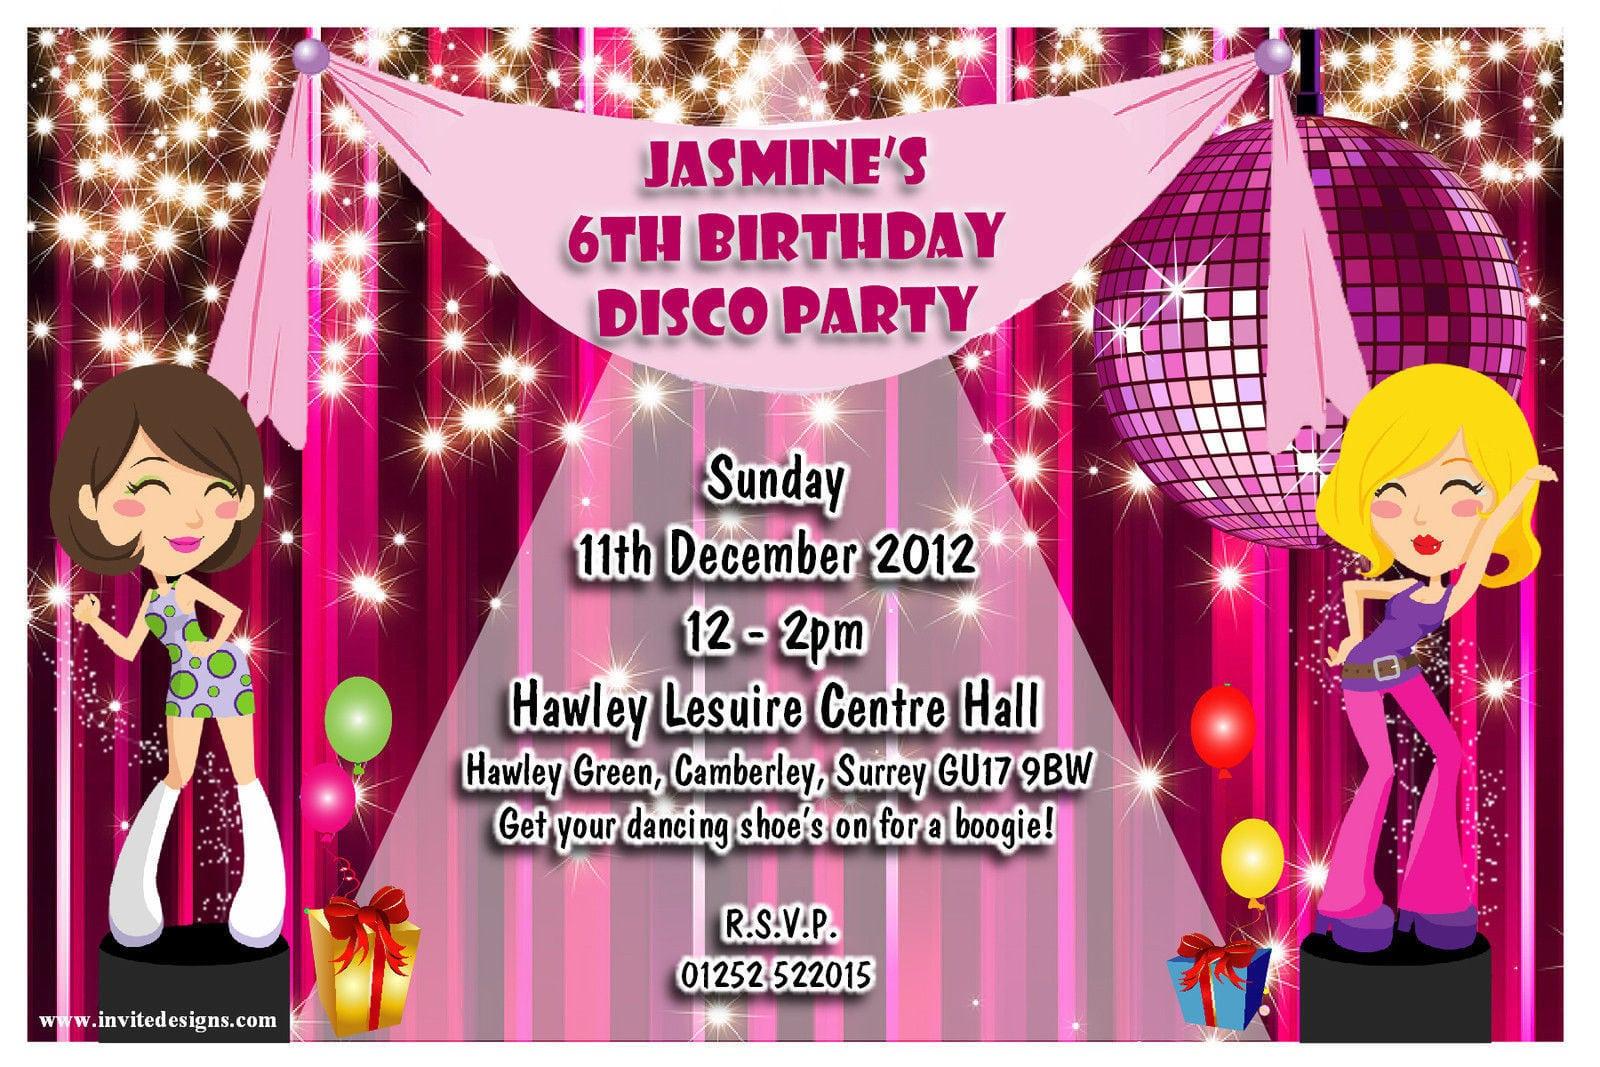 Disco Theme Party Invitations - Mickey Mouse Invitations Templates